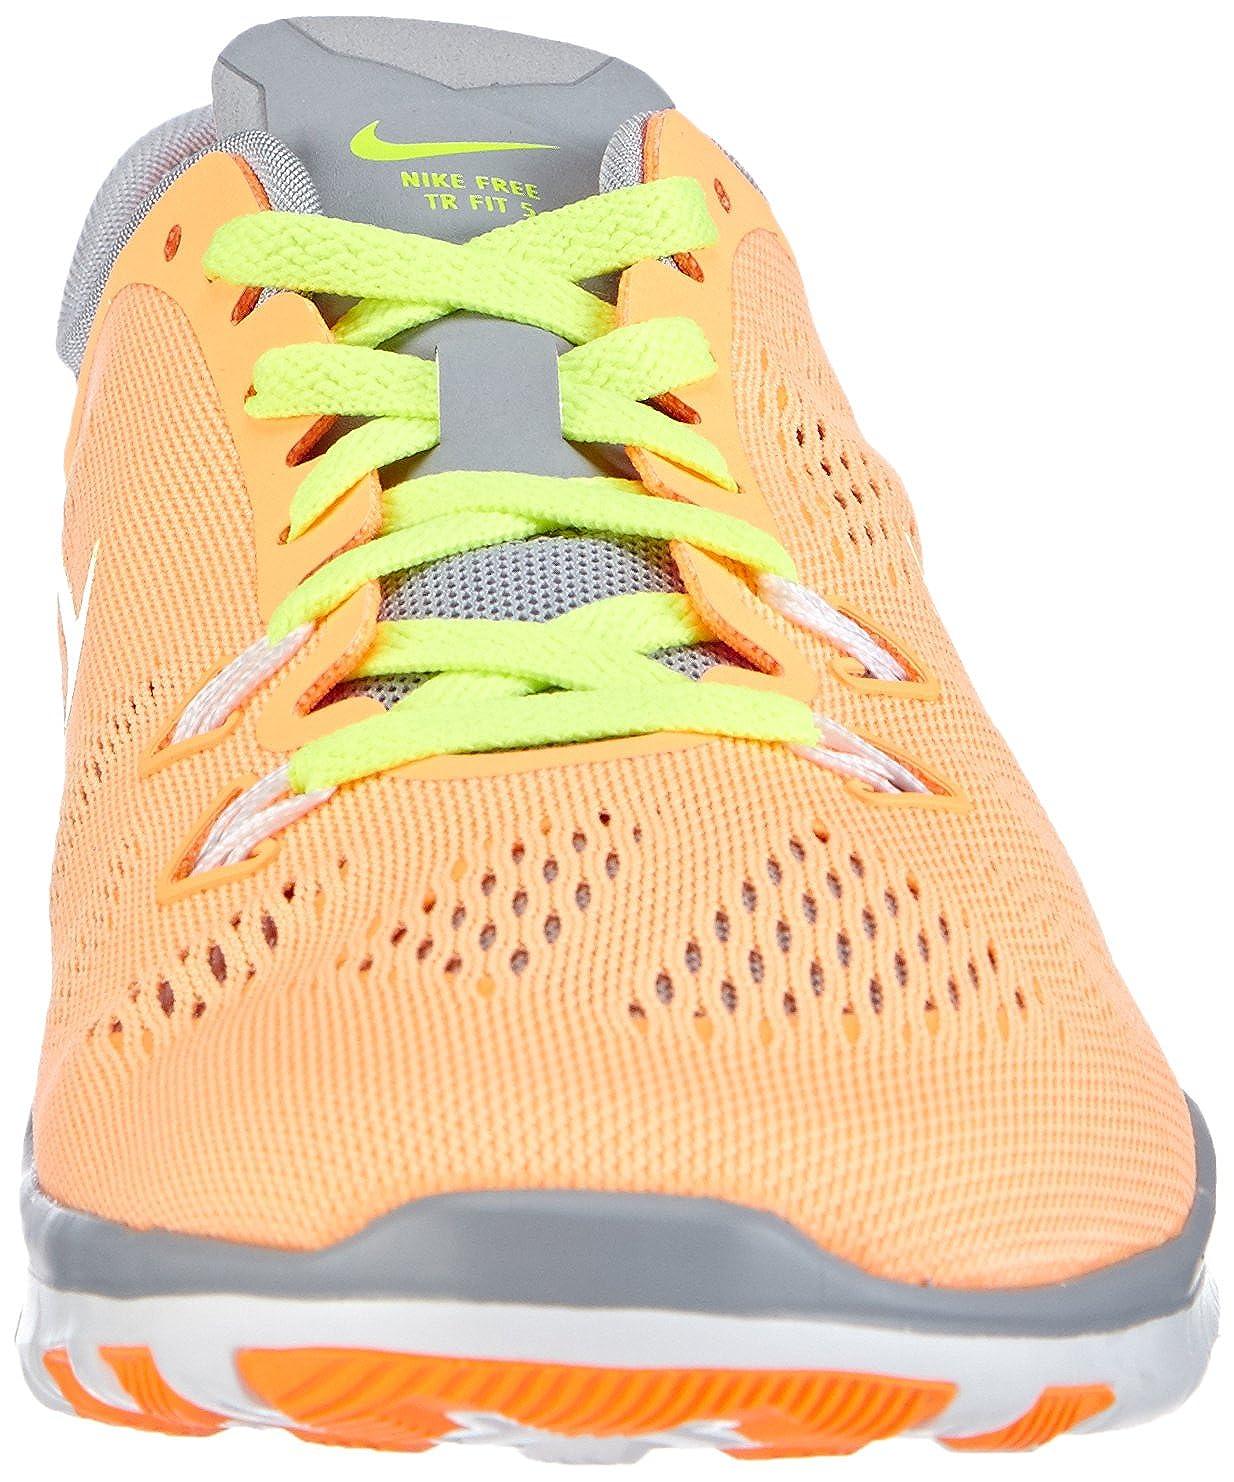 Nike Free TR Fit4 pink 38 bunte Schnürsenkel